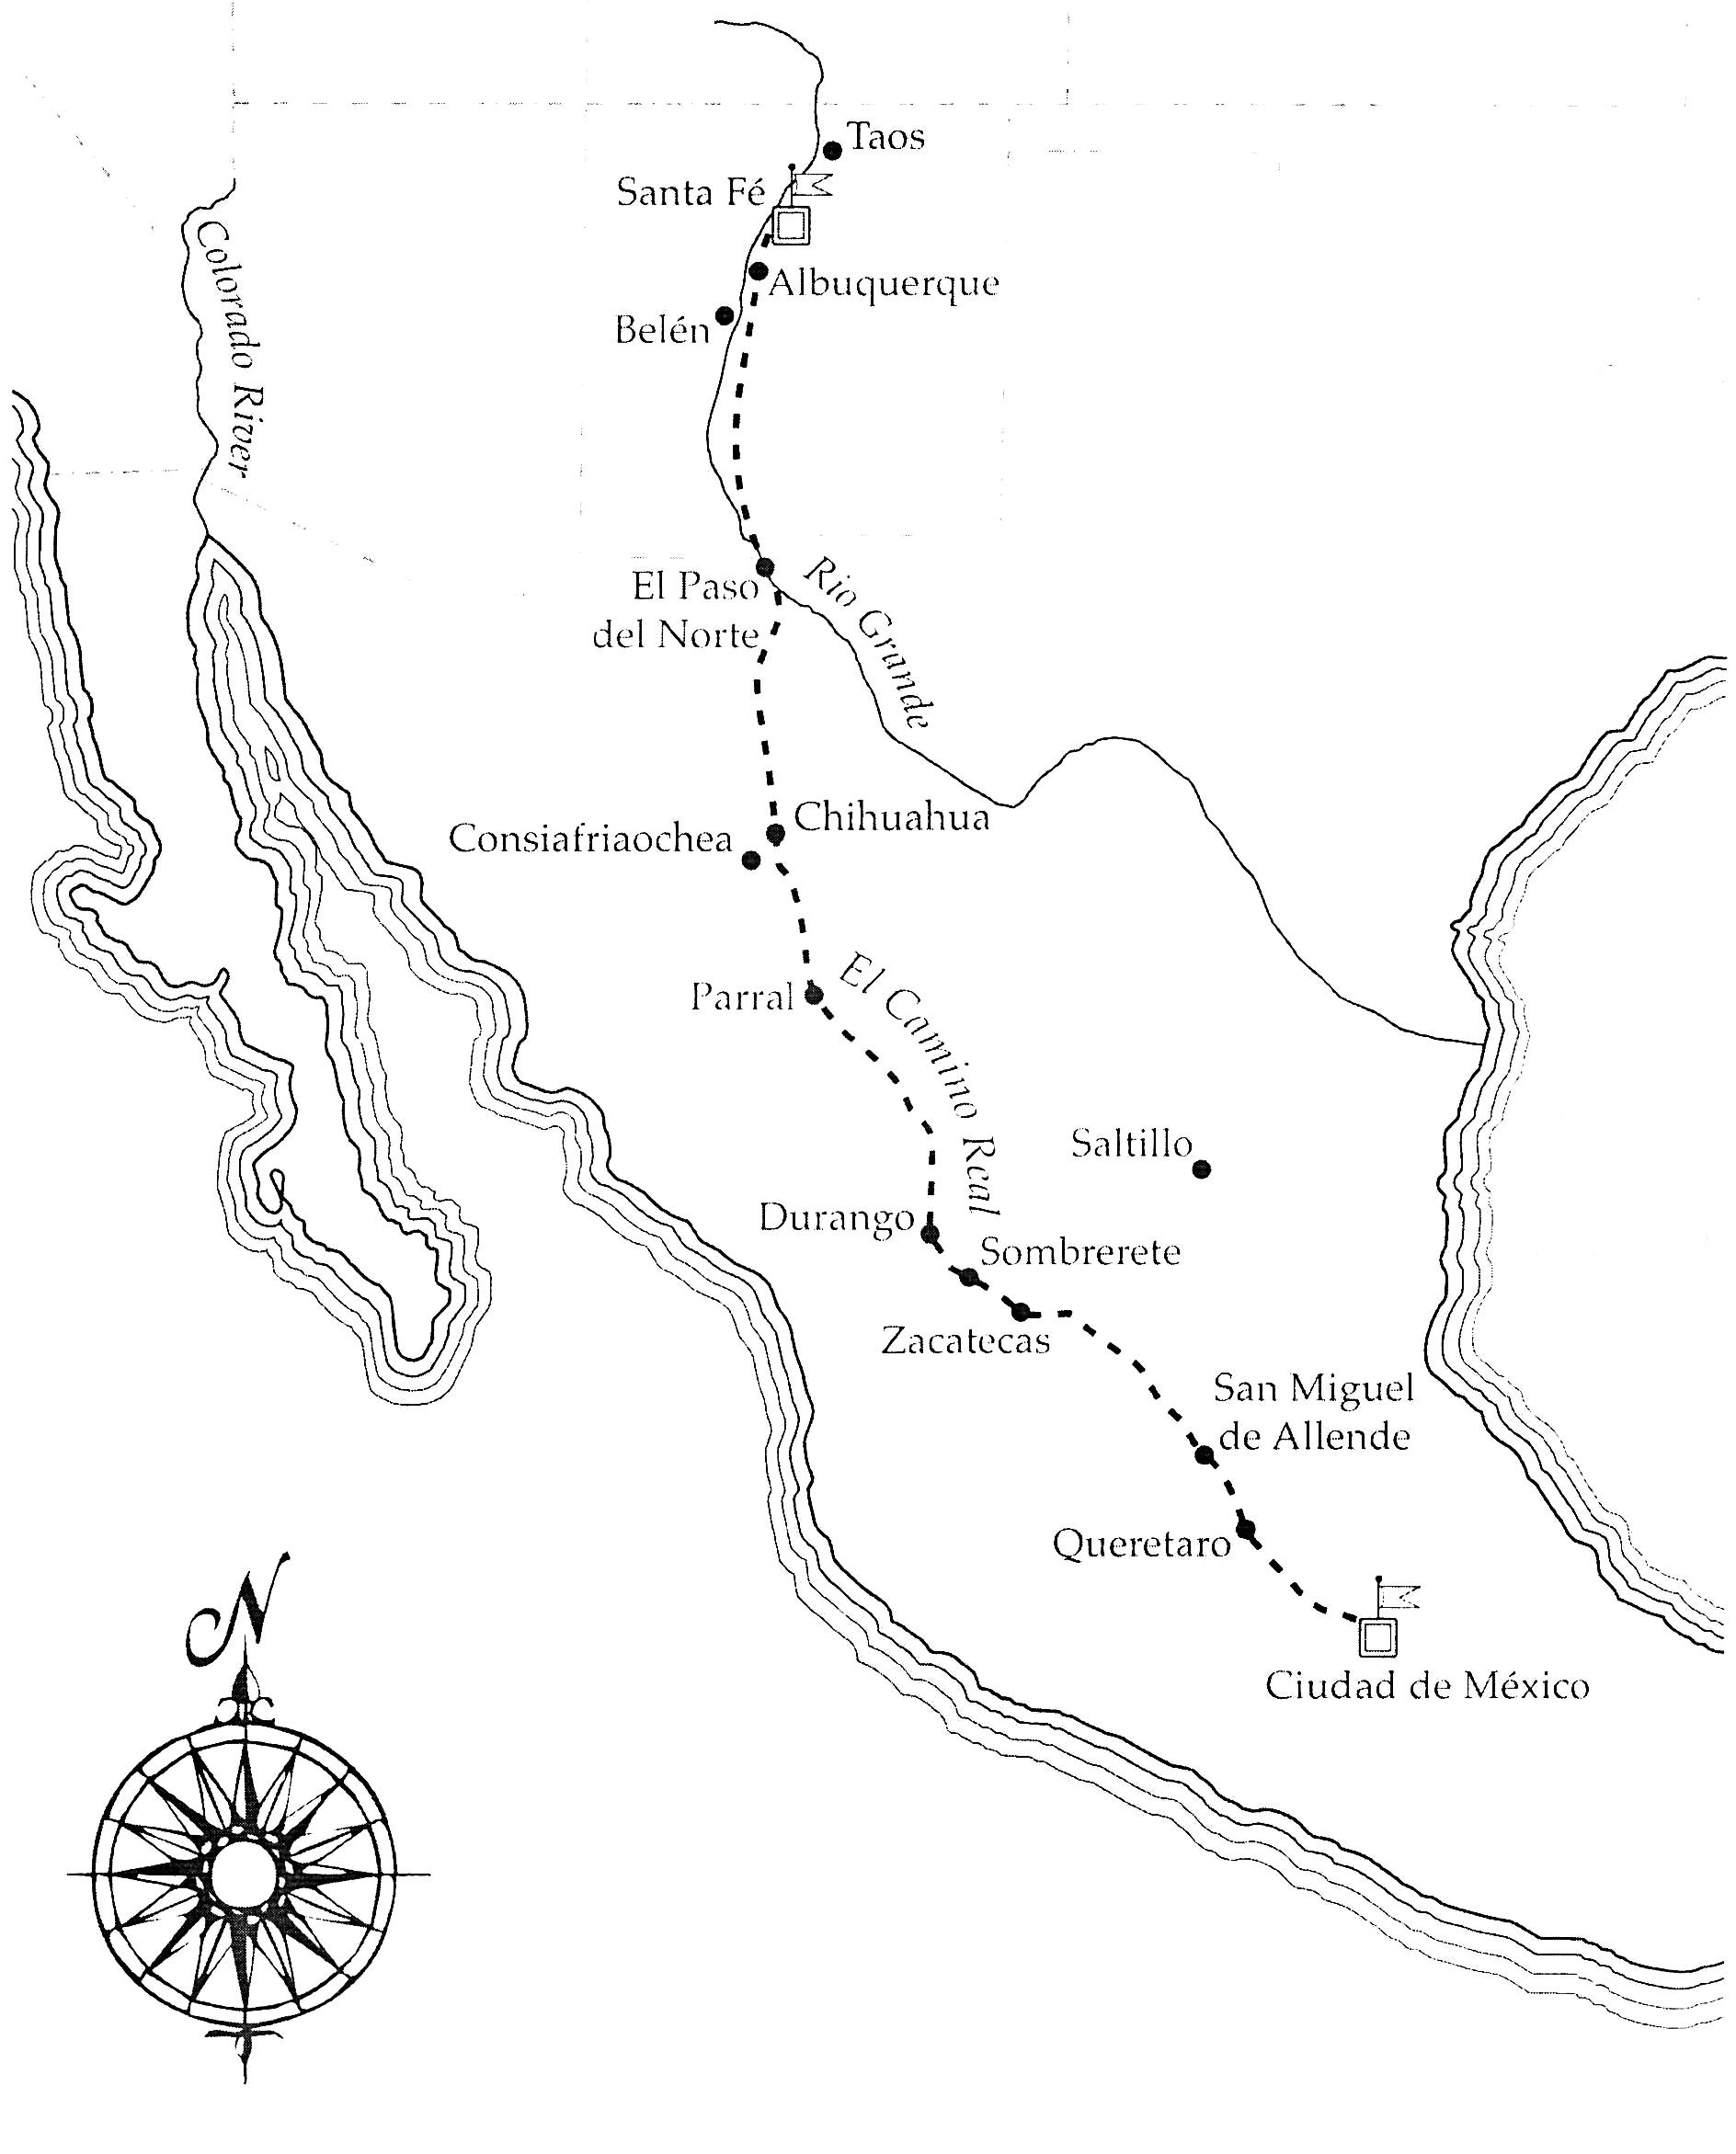 26 - Prisidios (Map 4)